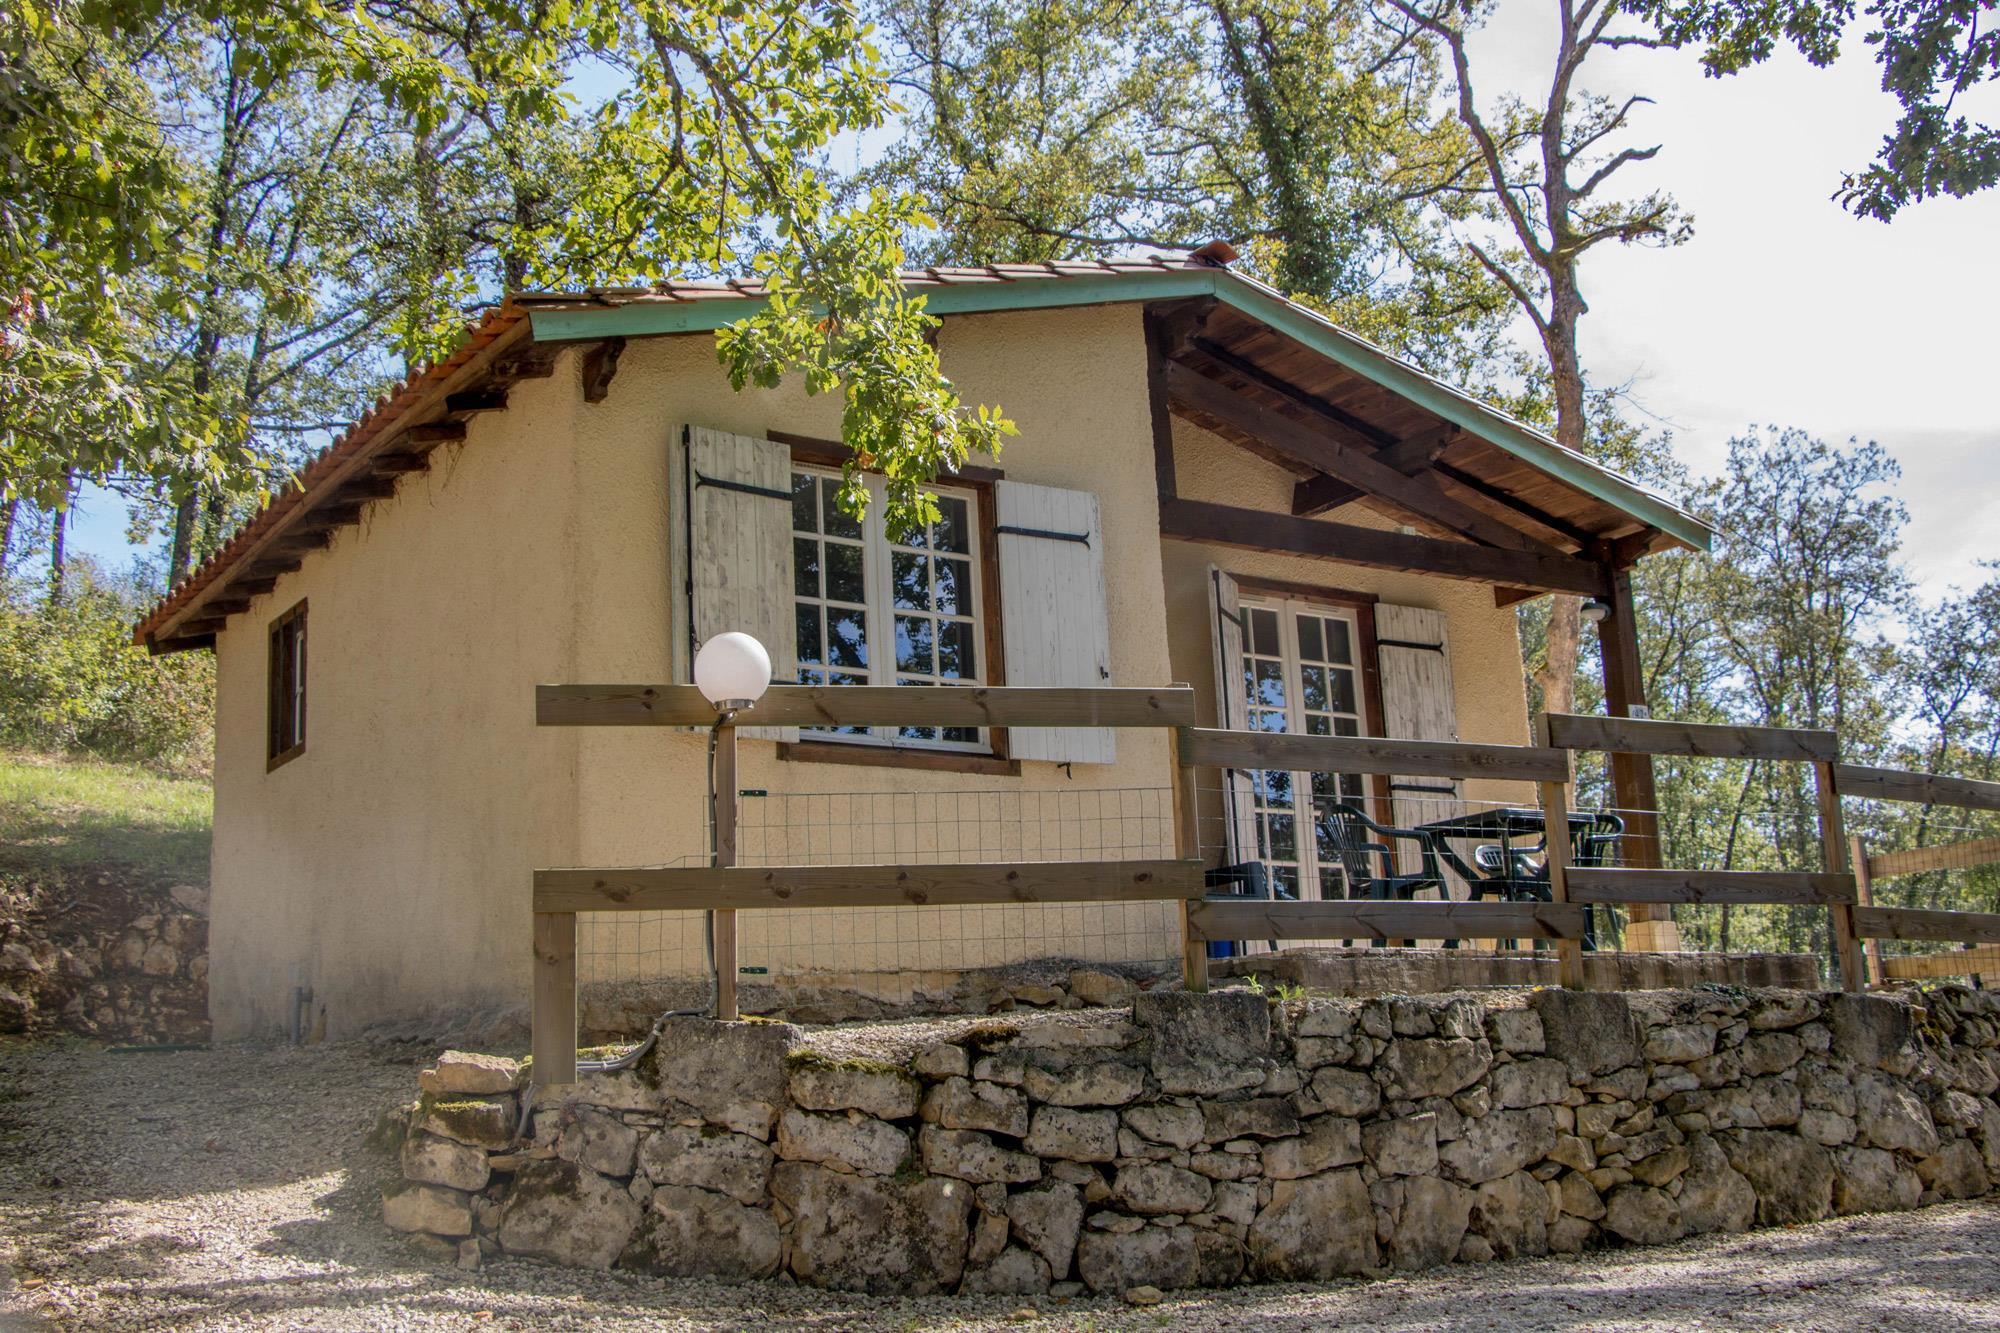 Location - Chalet Moorea - Camping Village le Moulin de Surier